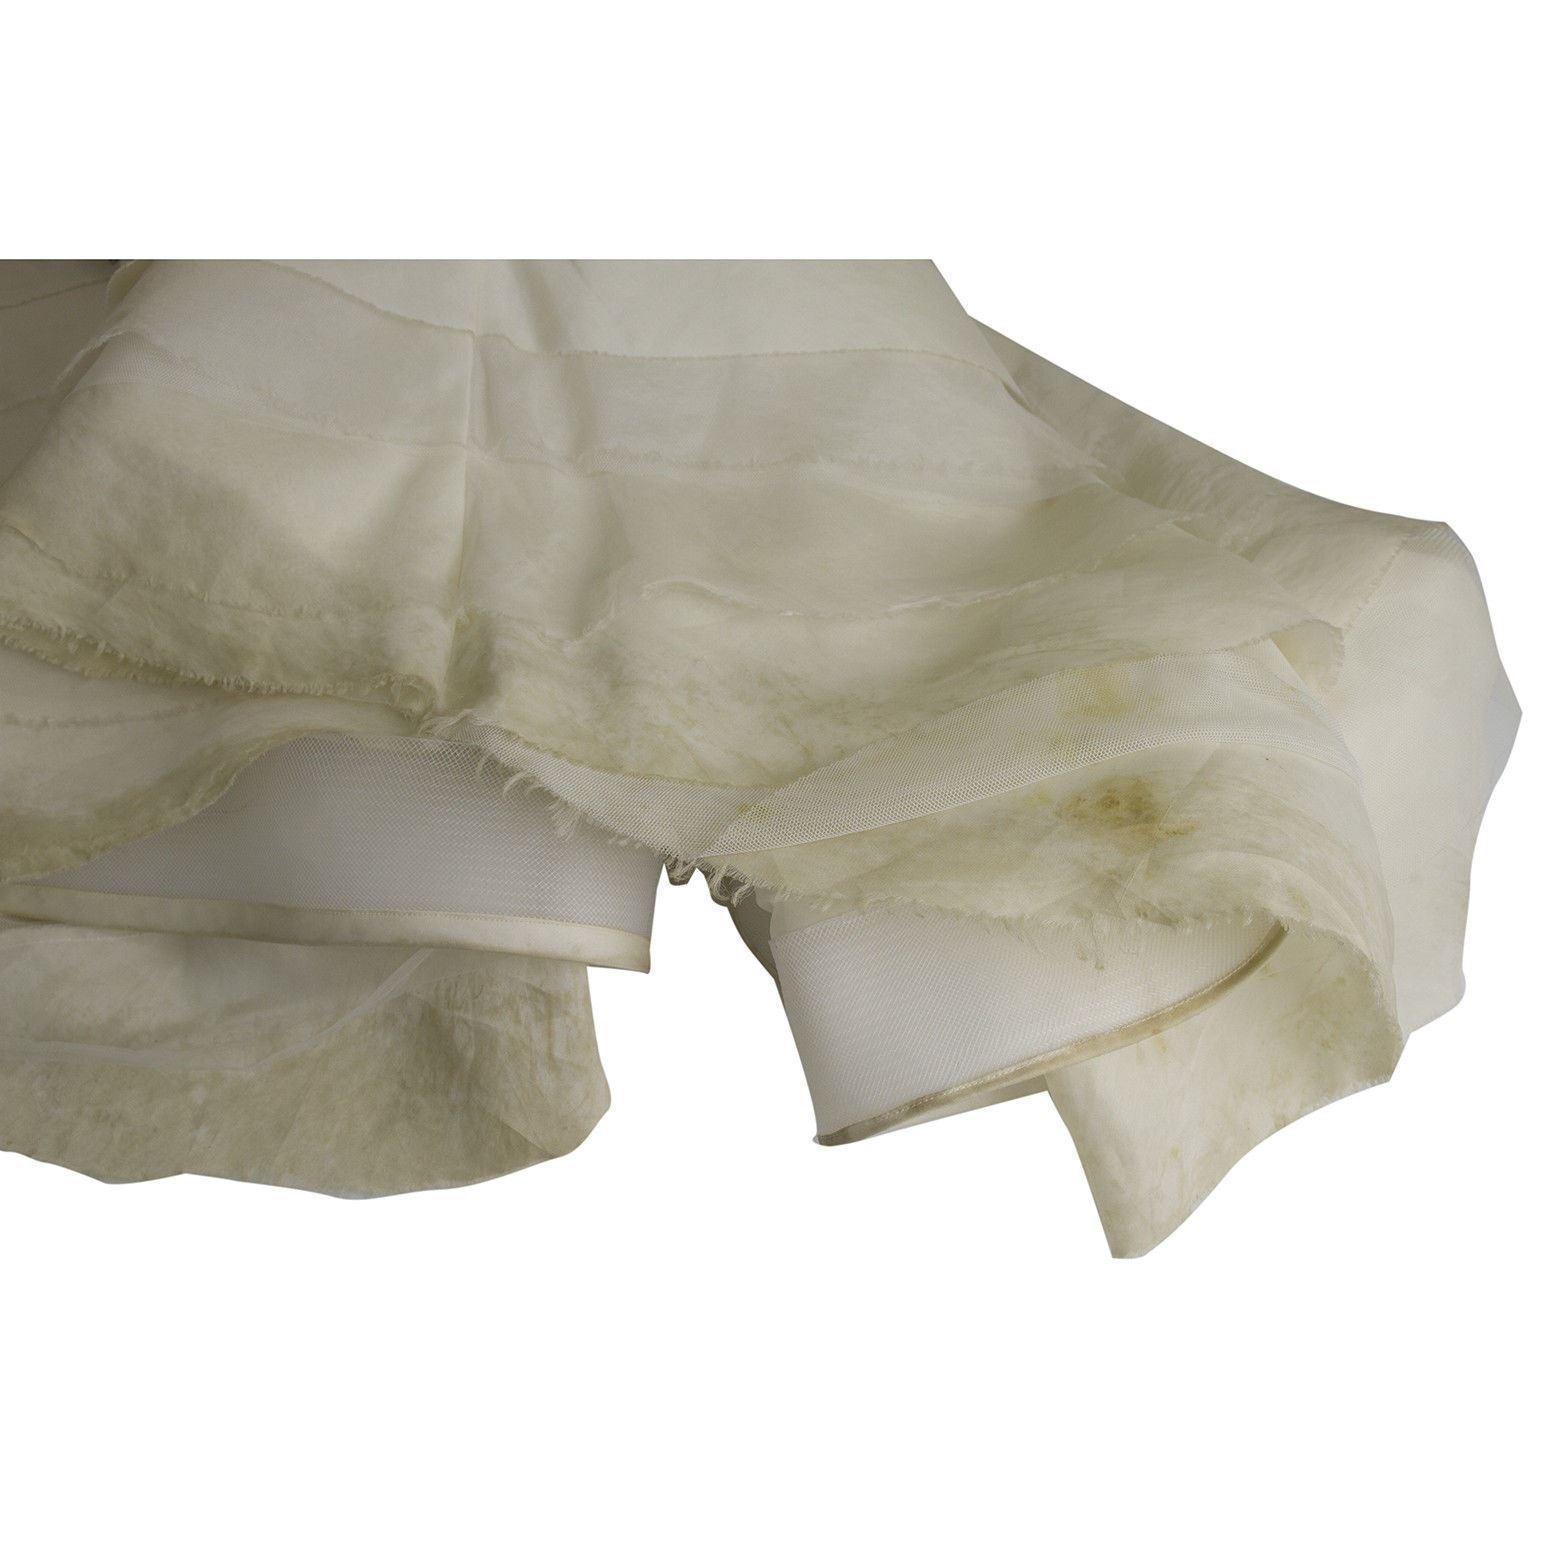 Vera Wang Silk Floor Length Bridal Wedding Gown Dress Strapless US 8 EU 42 image 7